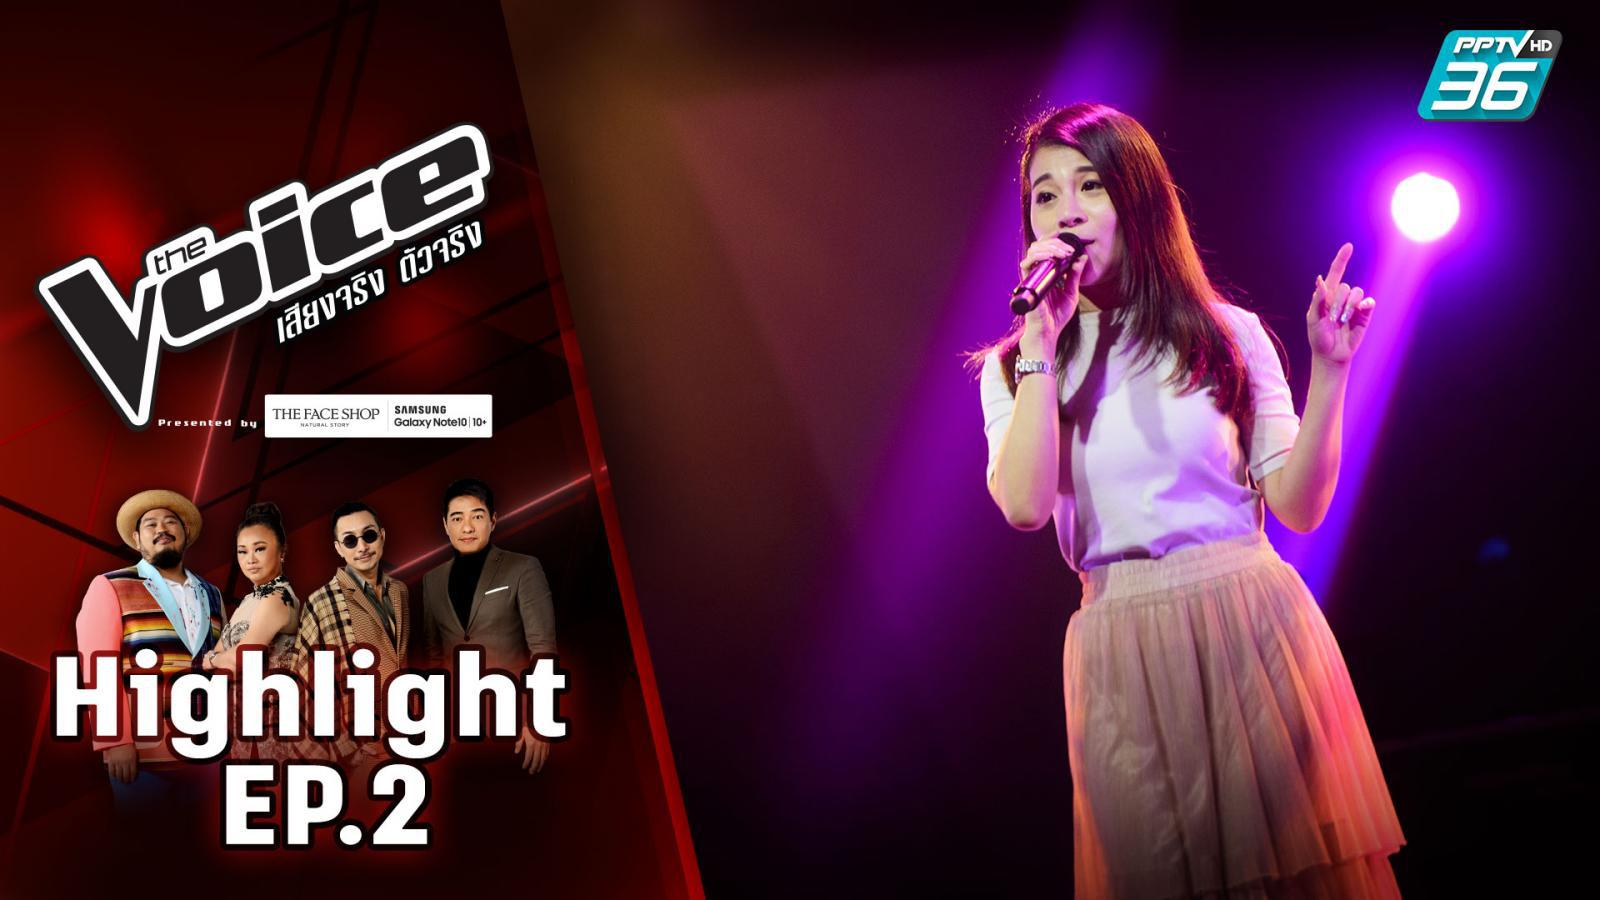 The Voice 2019 | เจอสาวสวนมุก ถึงกับเงิบ | Highlight EP.2